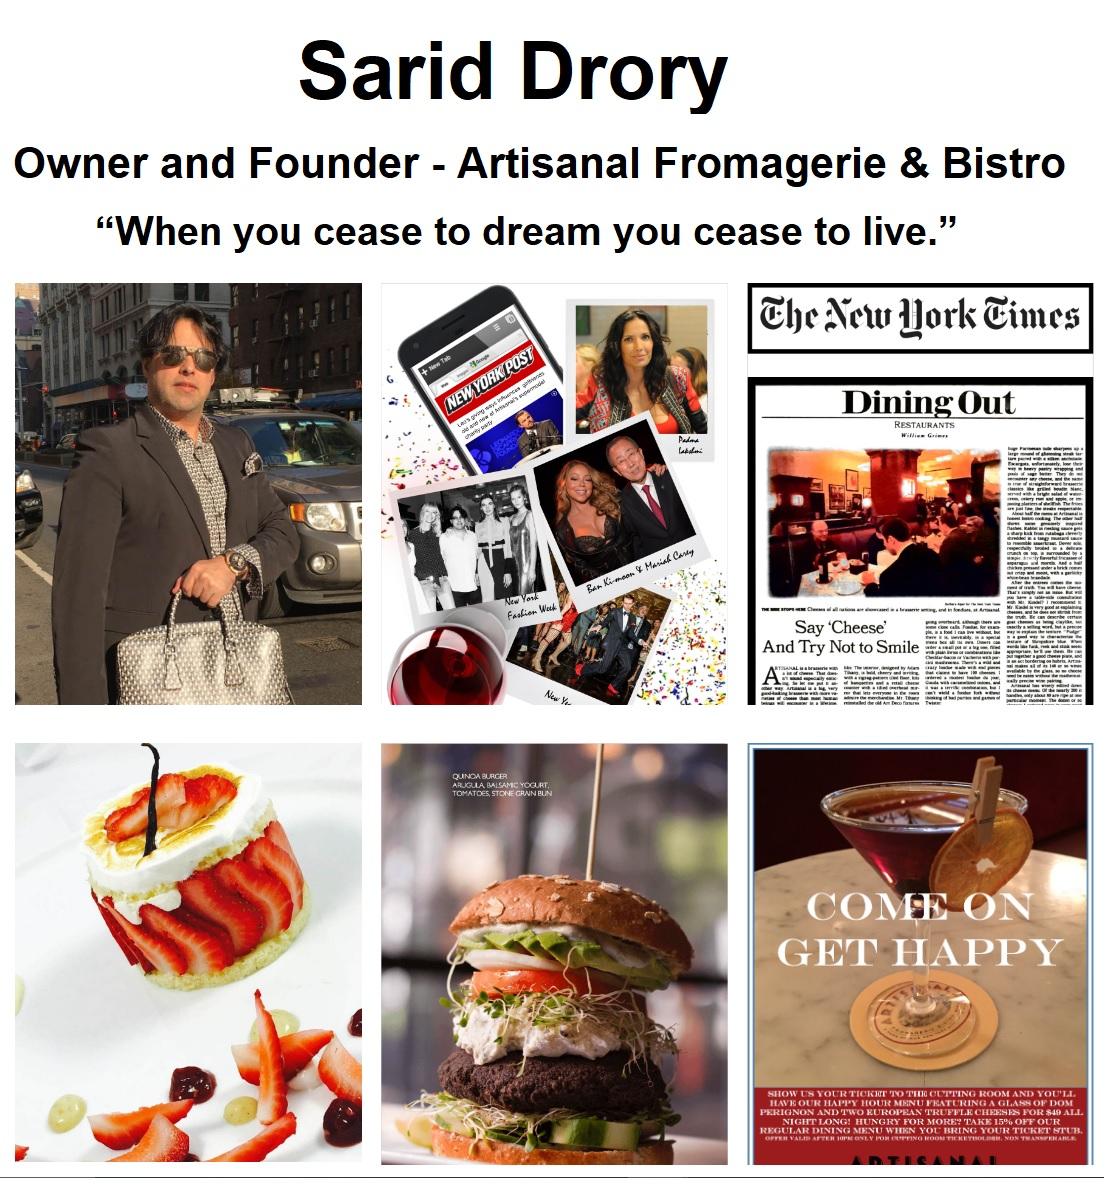 vincent sarid drory - שריד דרורי